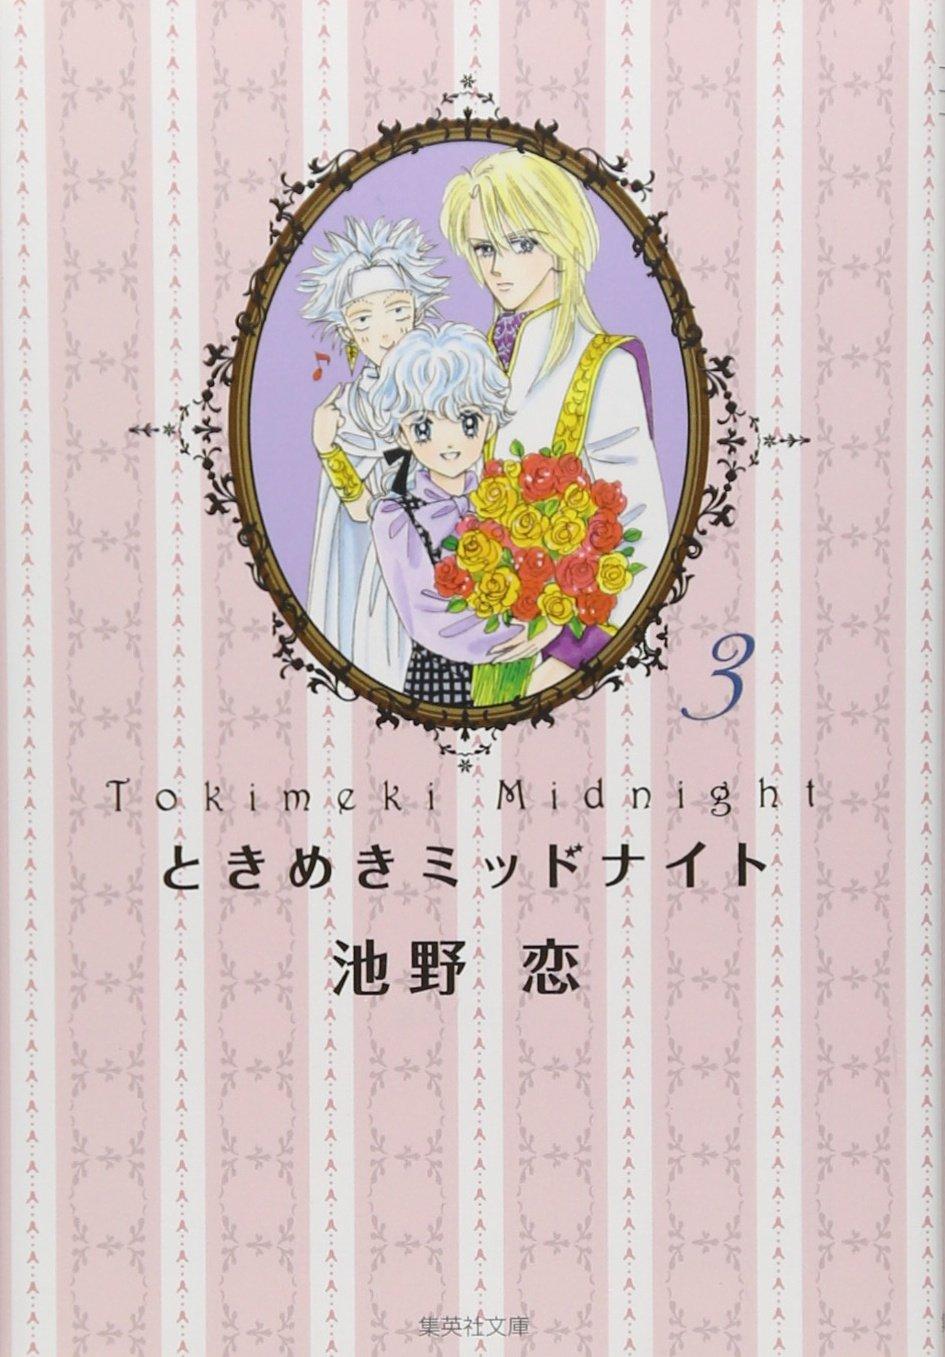 Read Online Tokimeki Midnight 3 (Shueisha Bunko doctor 41-19) (2011) ISBN: 4086192969 [Japanese Import] ebook